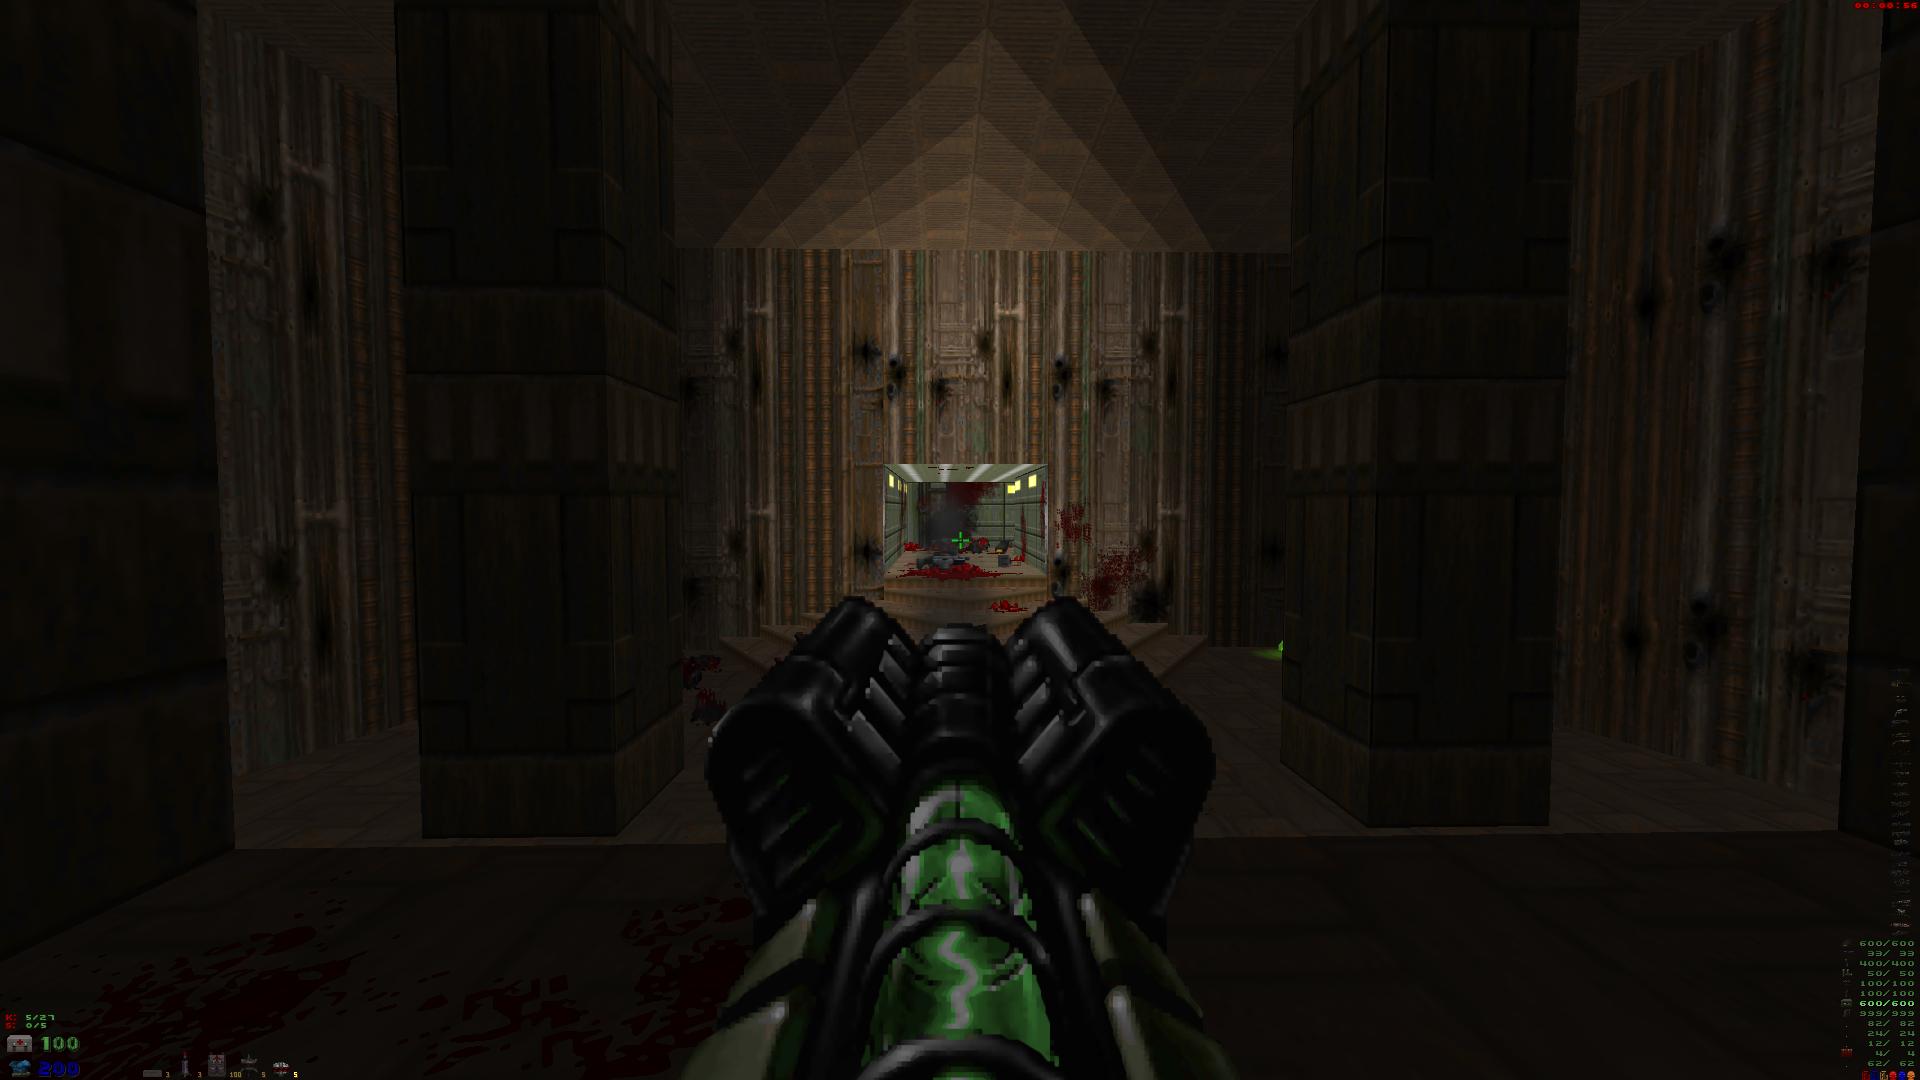 Death Battle Prelude: Doomslayer vs Undyne by